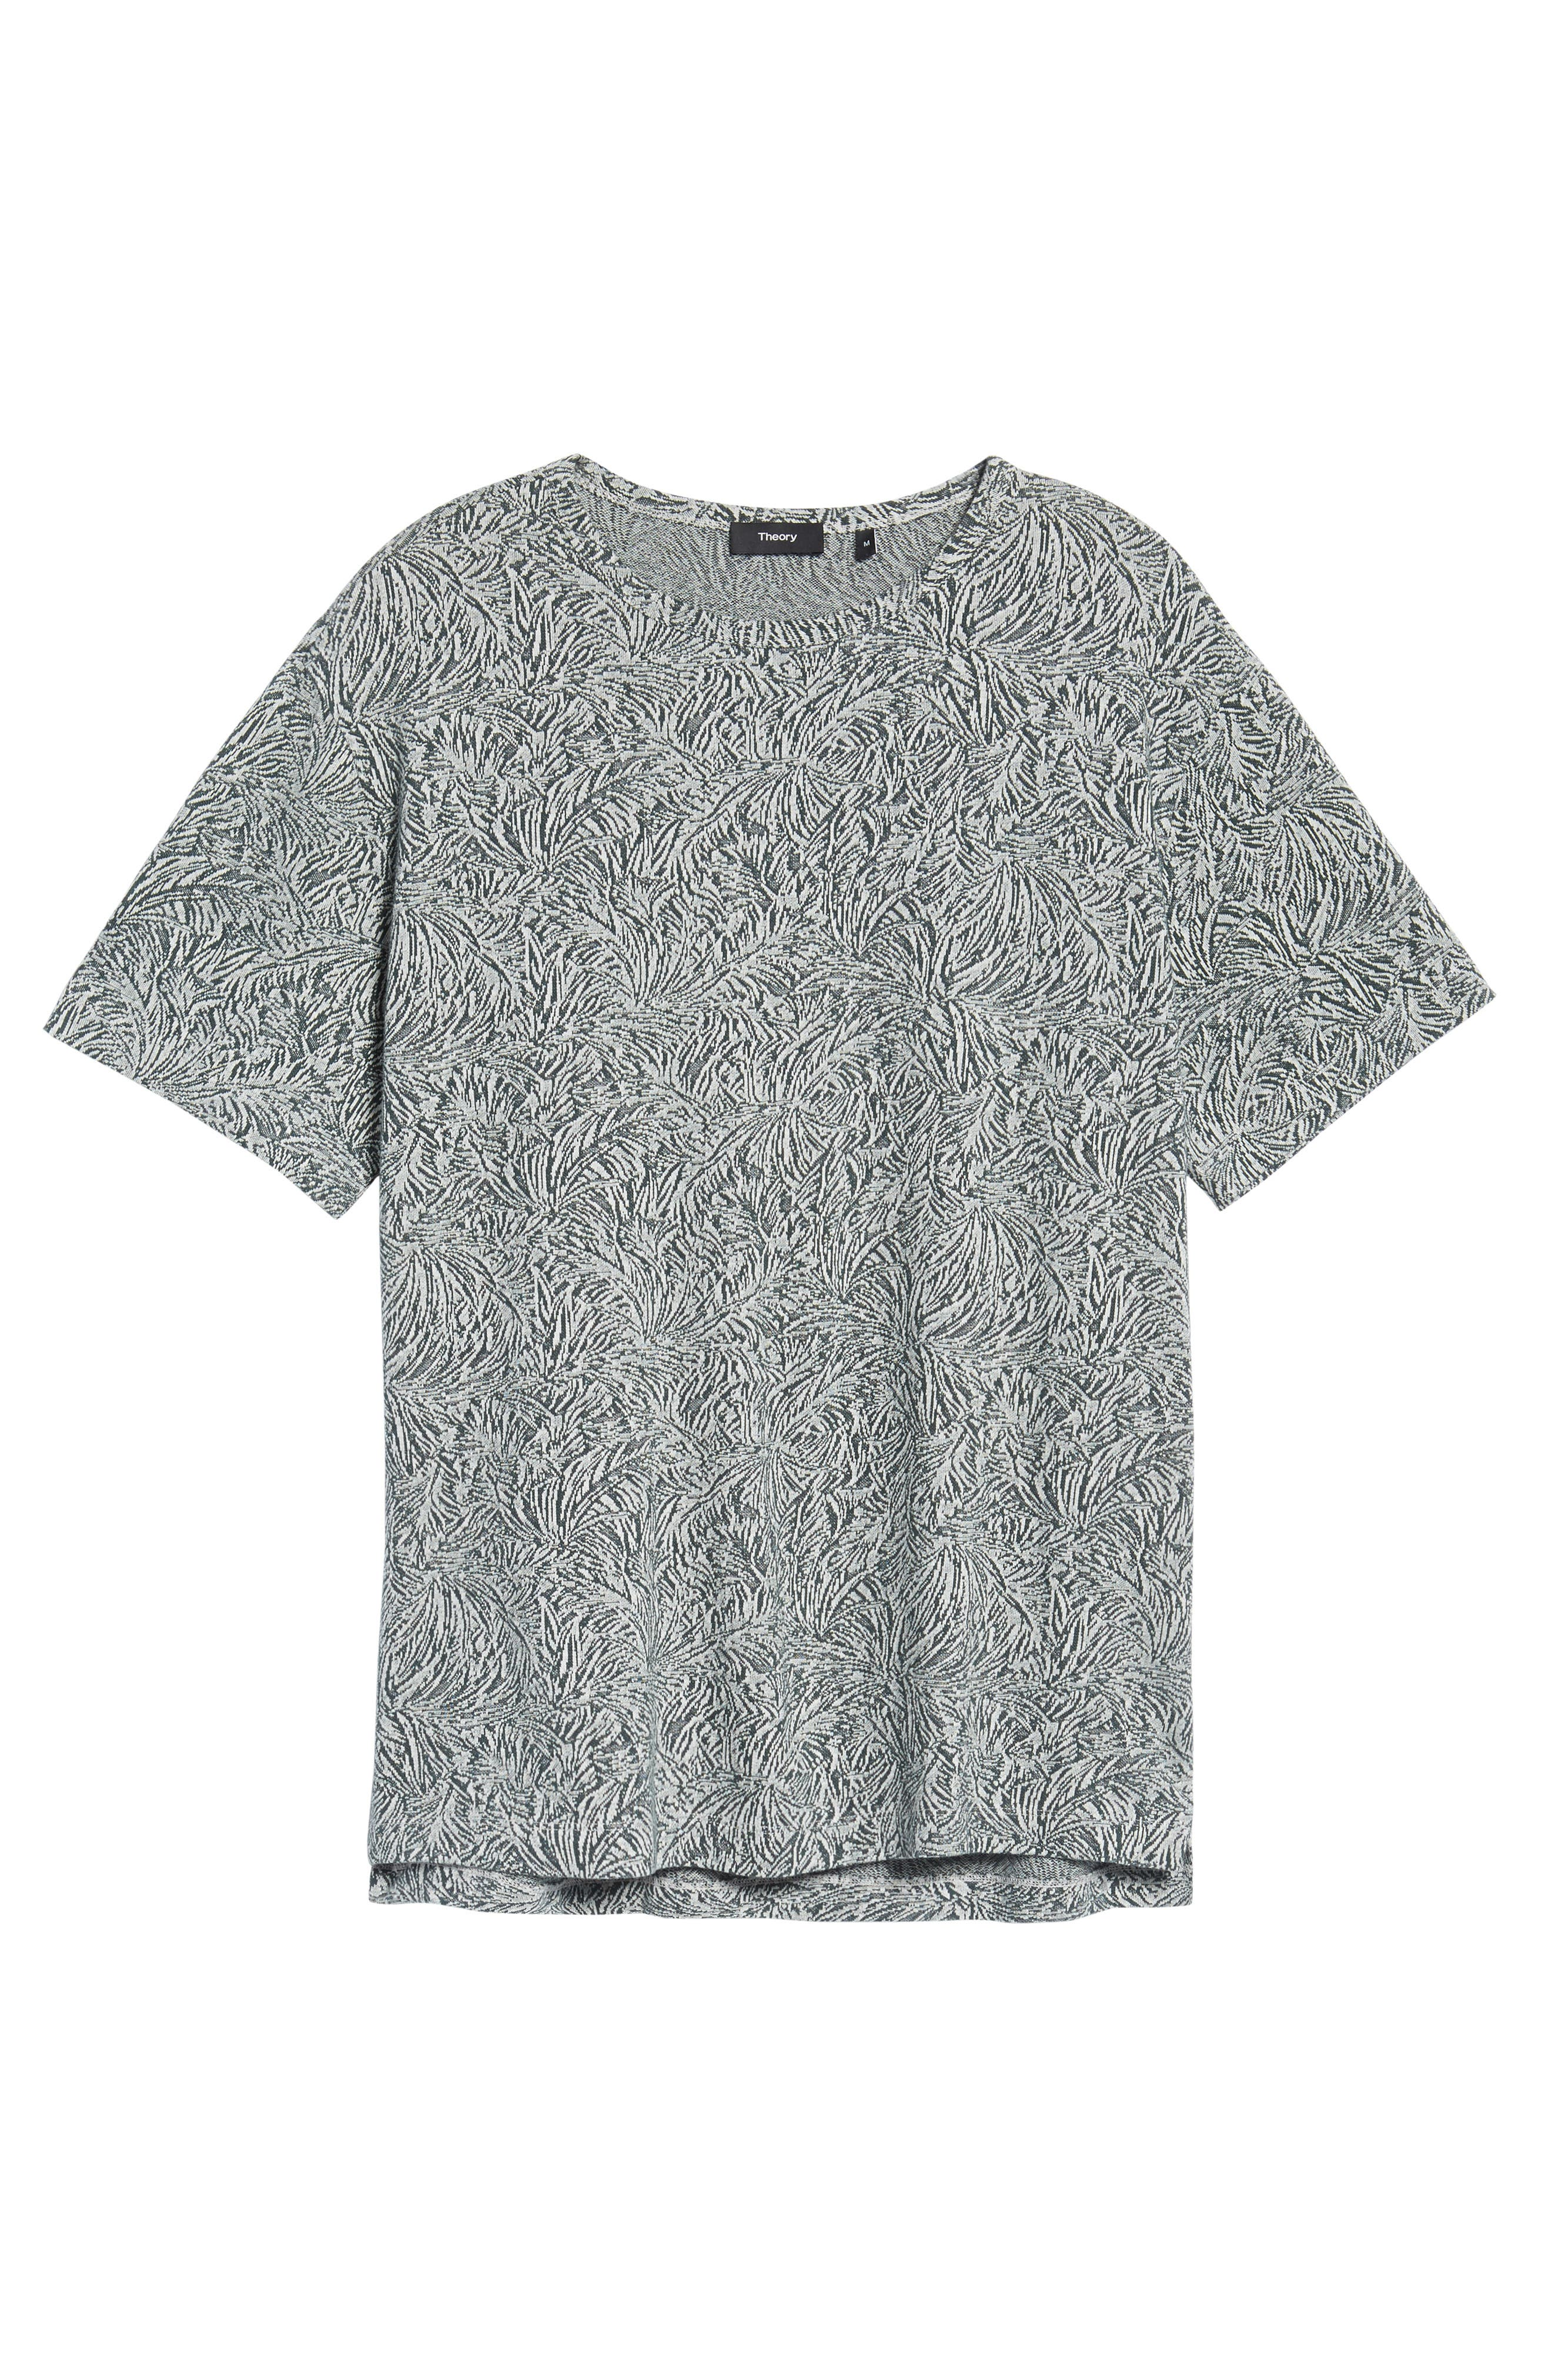 Palm Jacquard Crewneck T-Shirt,                             Alternate thumbnail 6, color,